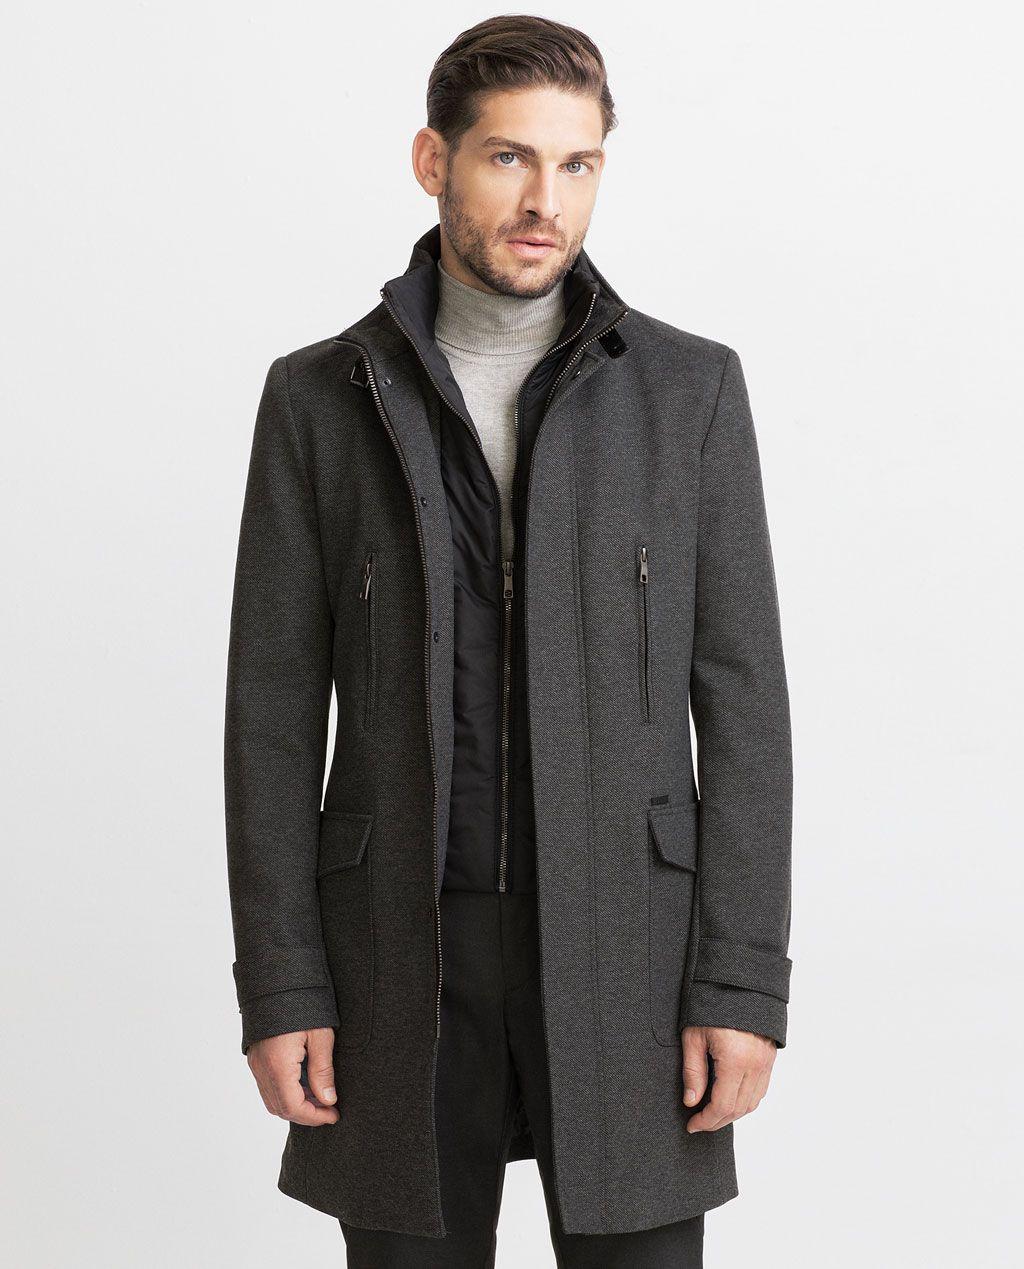 DIAGONAL COAT View all Outerwear MAN | ZARA United States